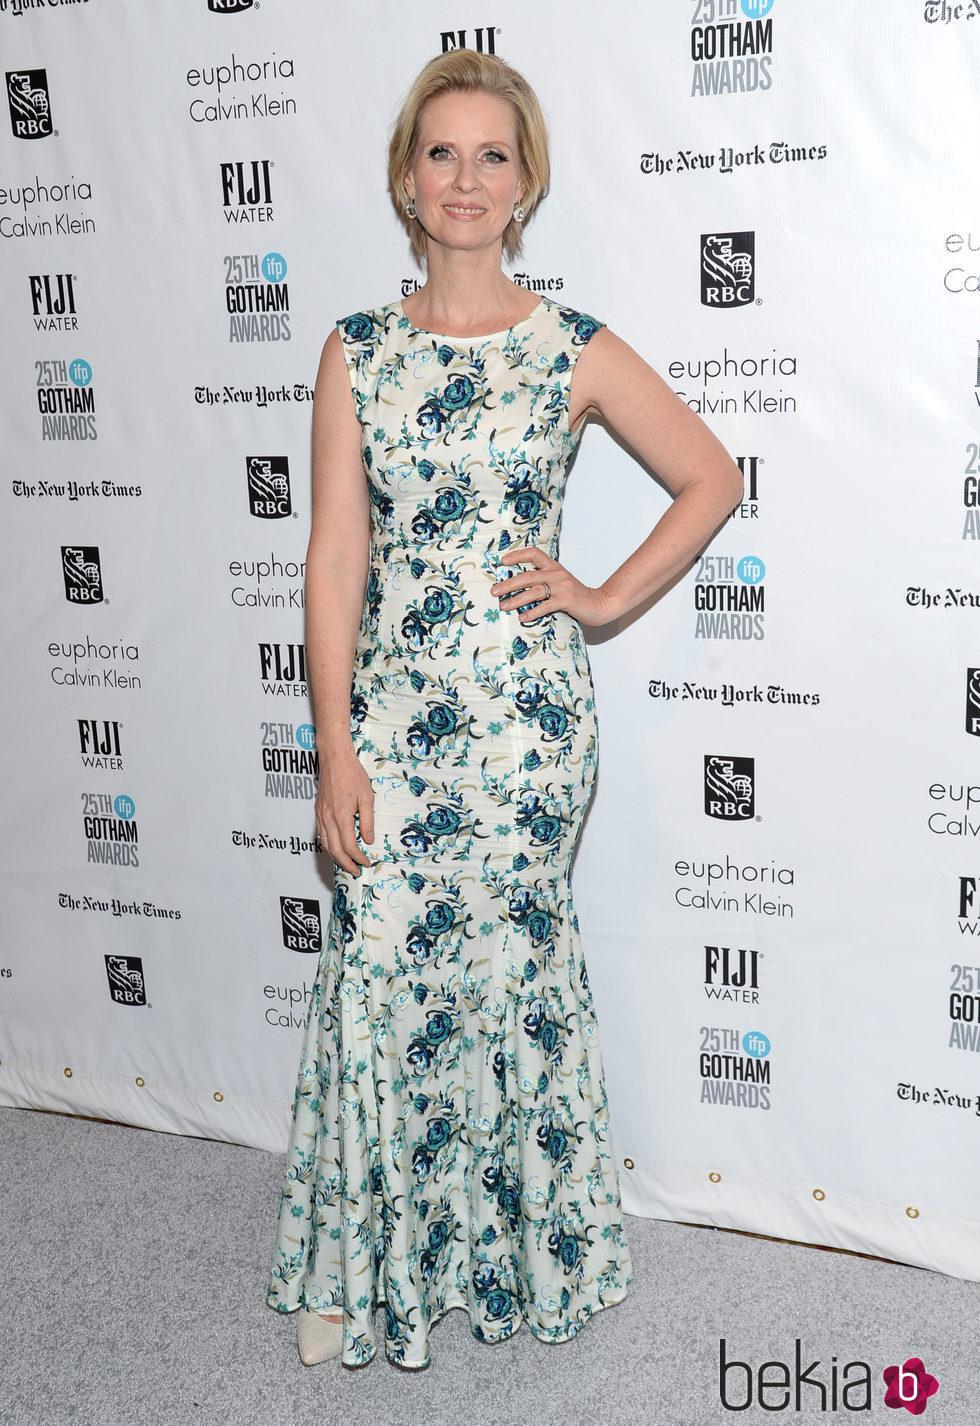 Cynthia Nixon en los Premios Gotham 2015